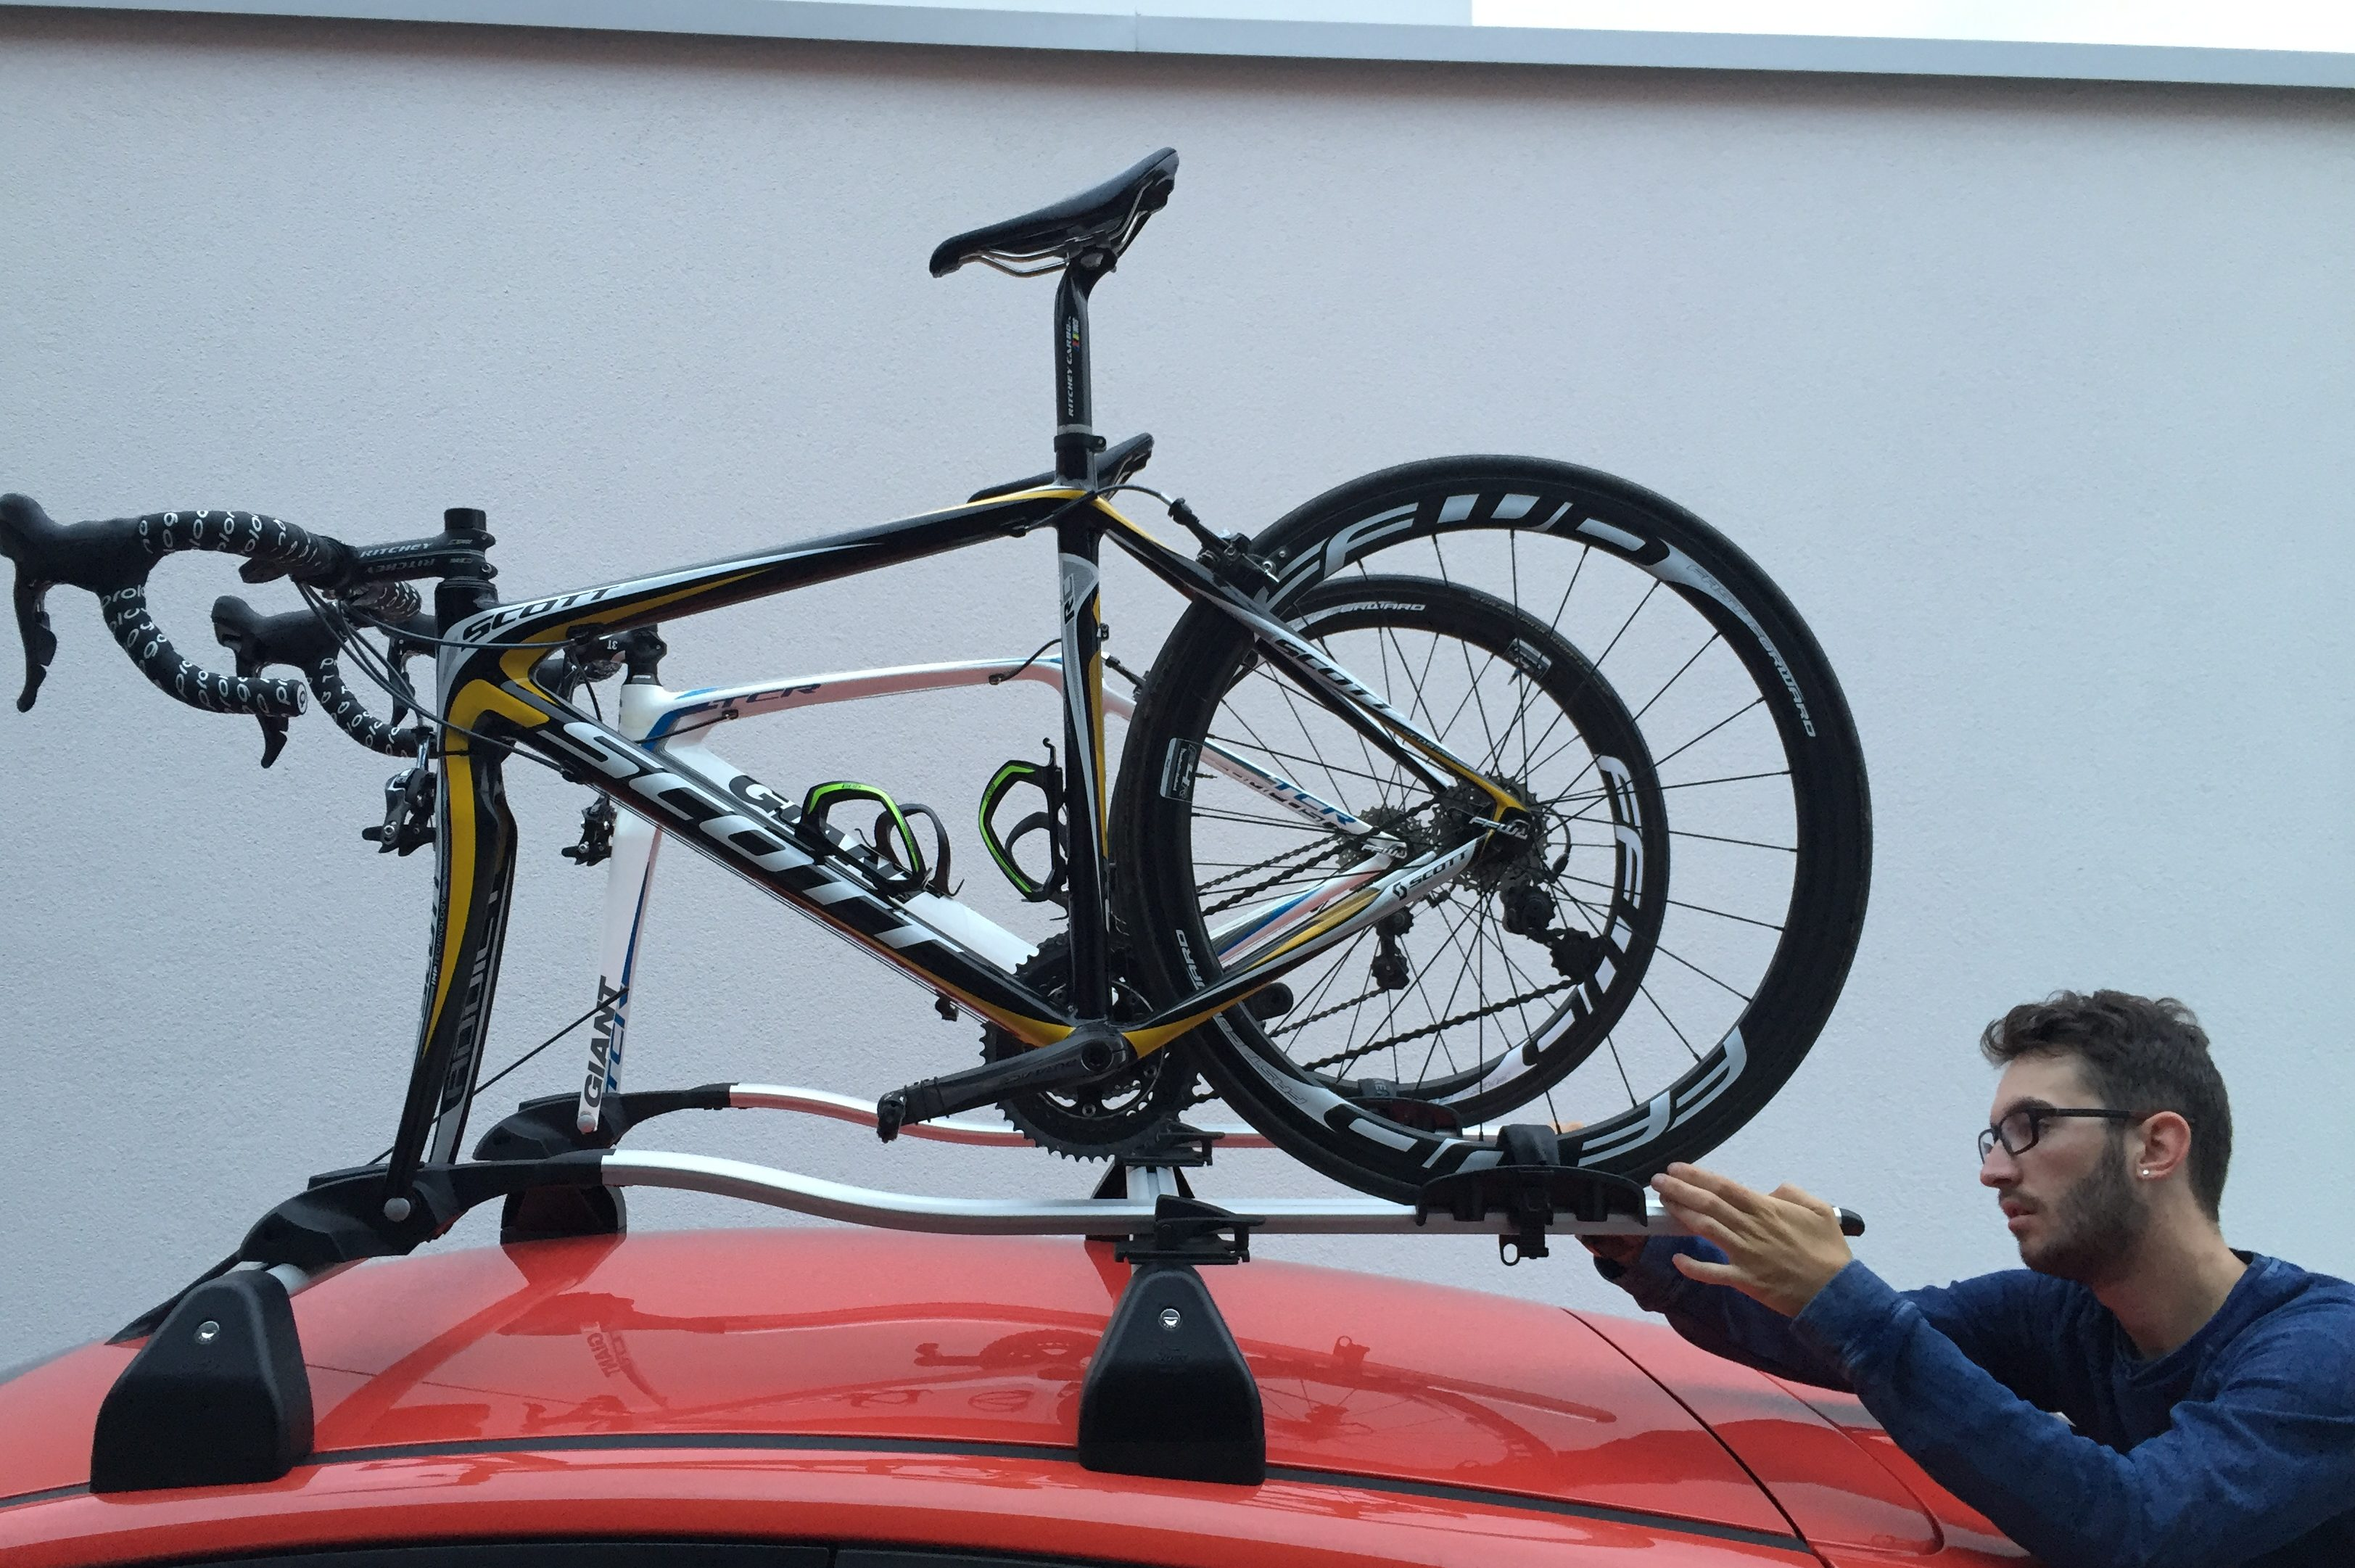 Radblog, Rennradblog, Blog, Cycling, Österreich, Geradeaus, Team, Andy, Tini, Passion, Cycling,